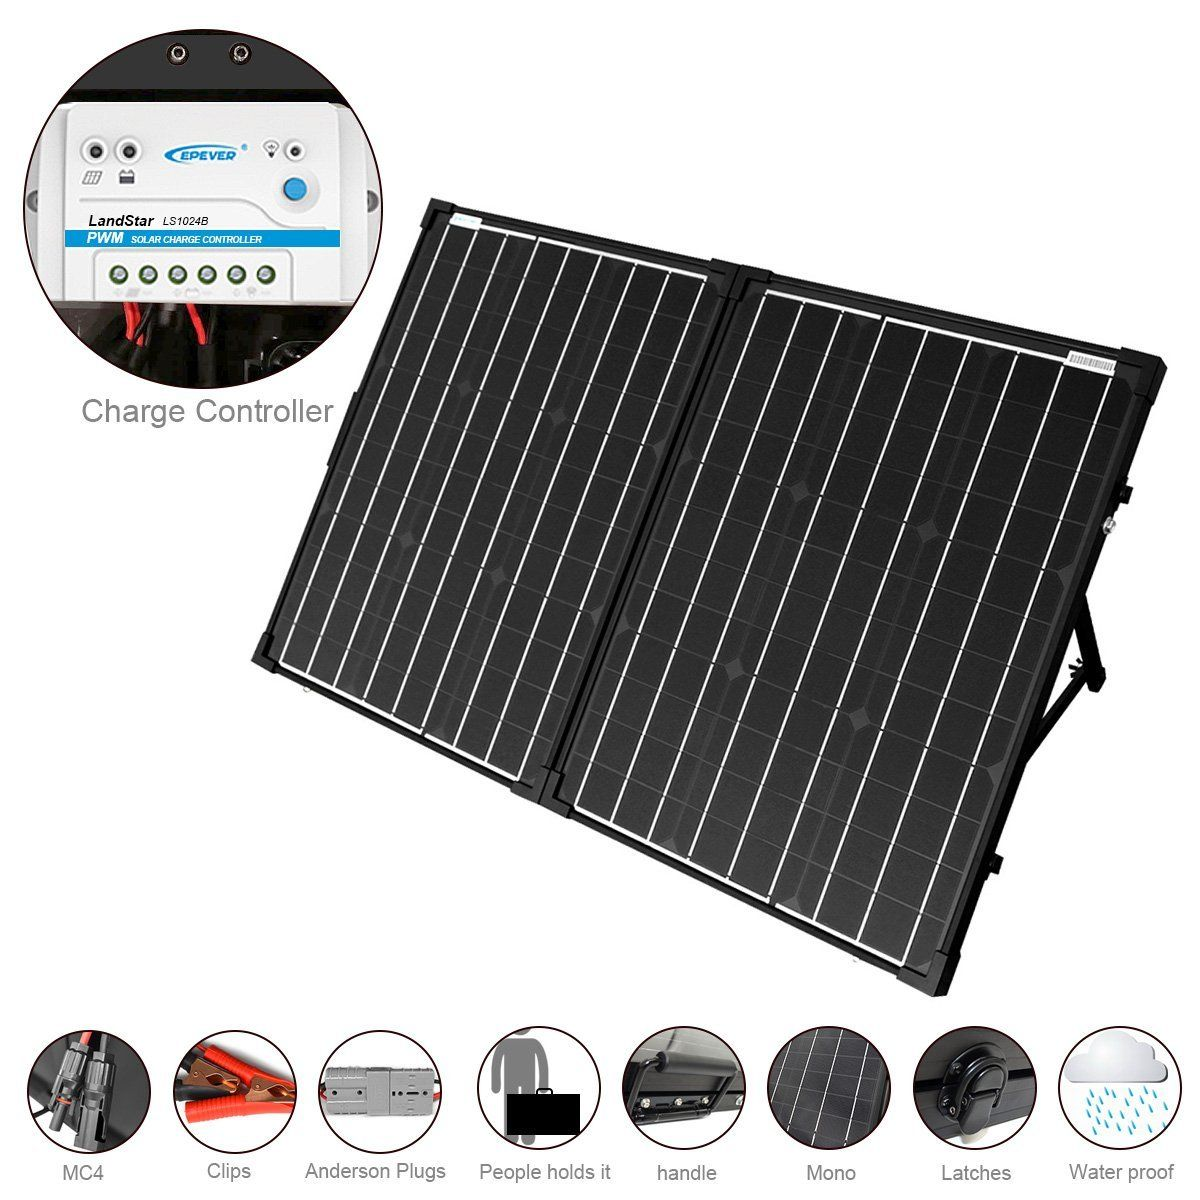 Amazon Com Acopower 100w Foldable Solar Panel Kit 12v Battery And Generator Ready Suitcase With Charge Contr Solar Panel Kits Best Solar Panels Solar Panels